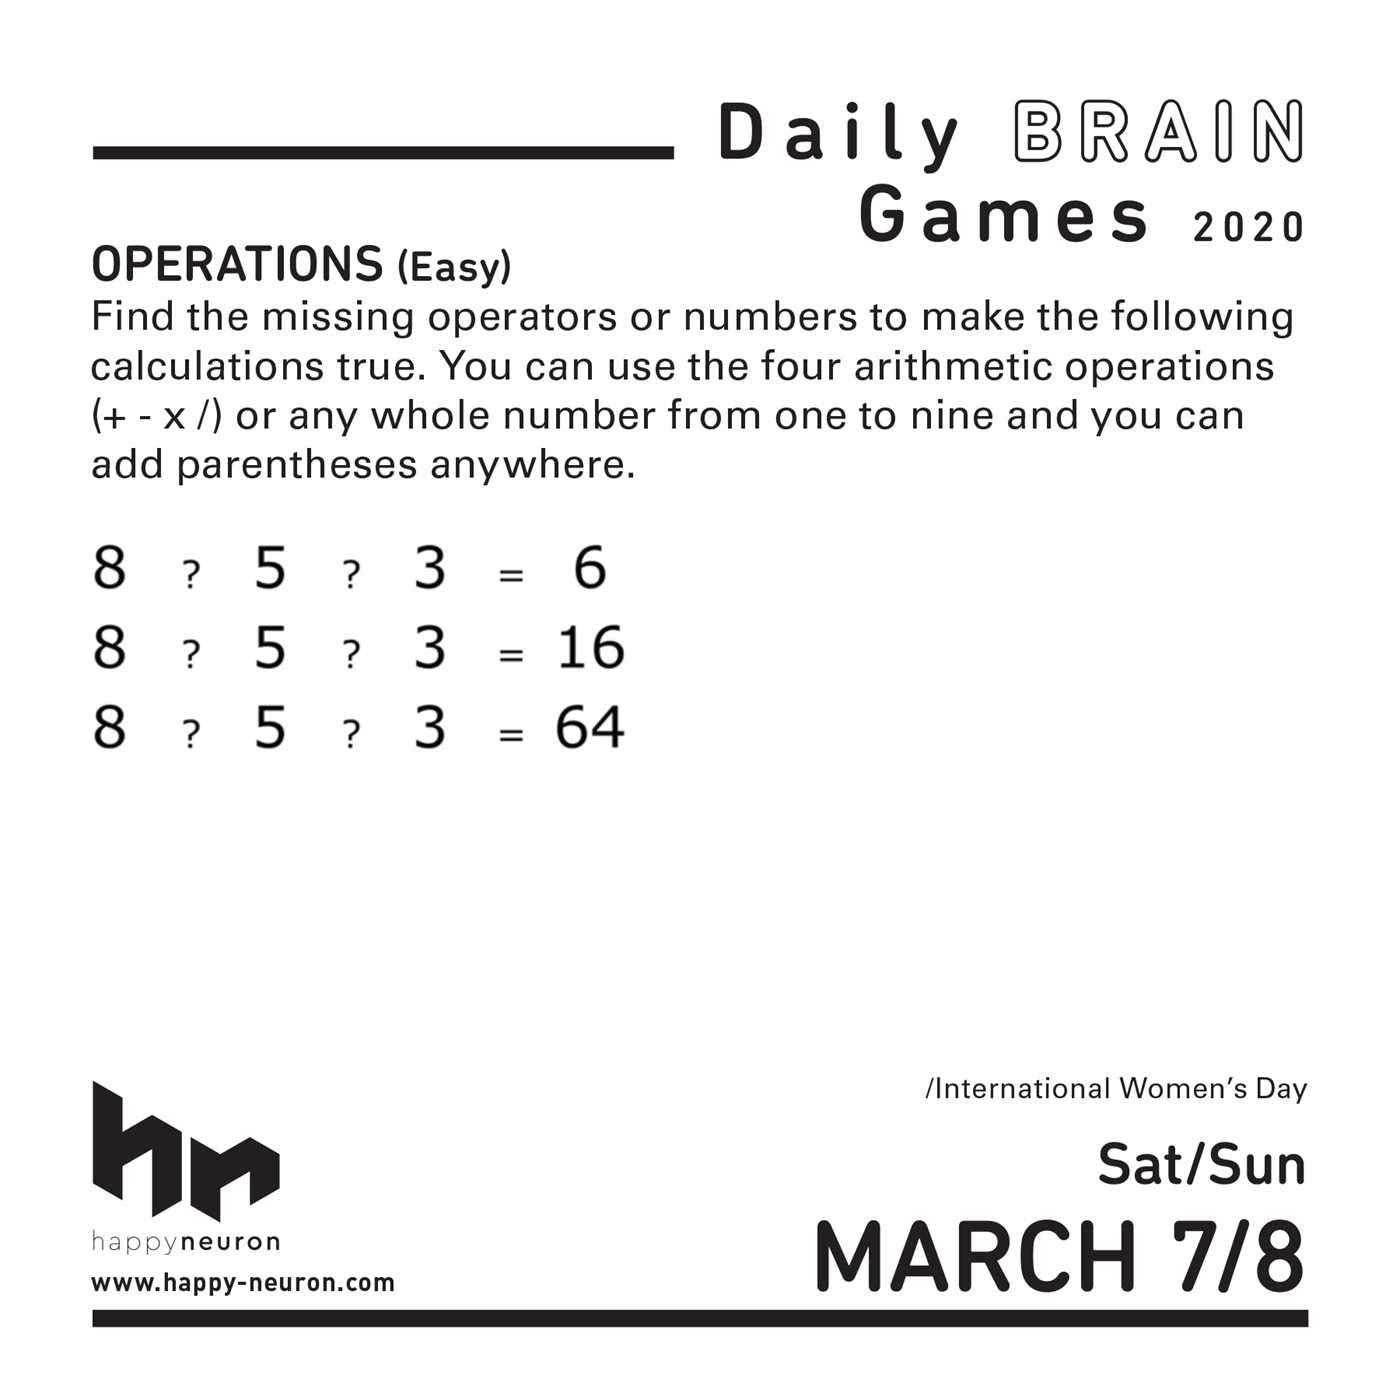 Nyit Calendar 2022.Daily Brain Games 2020 Day To Day Calendar Happyneuron 0050837424586 Amazon Com Books